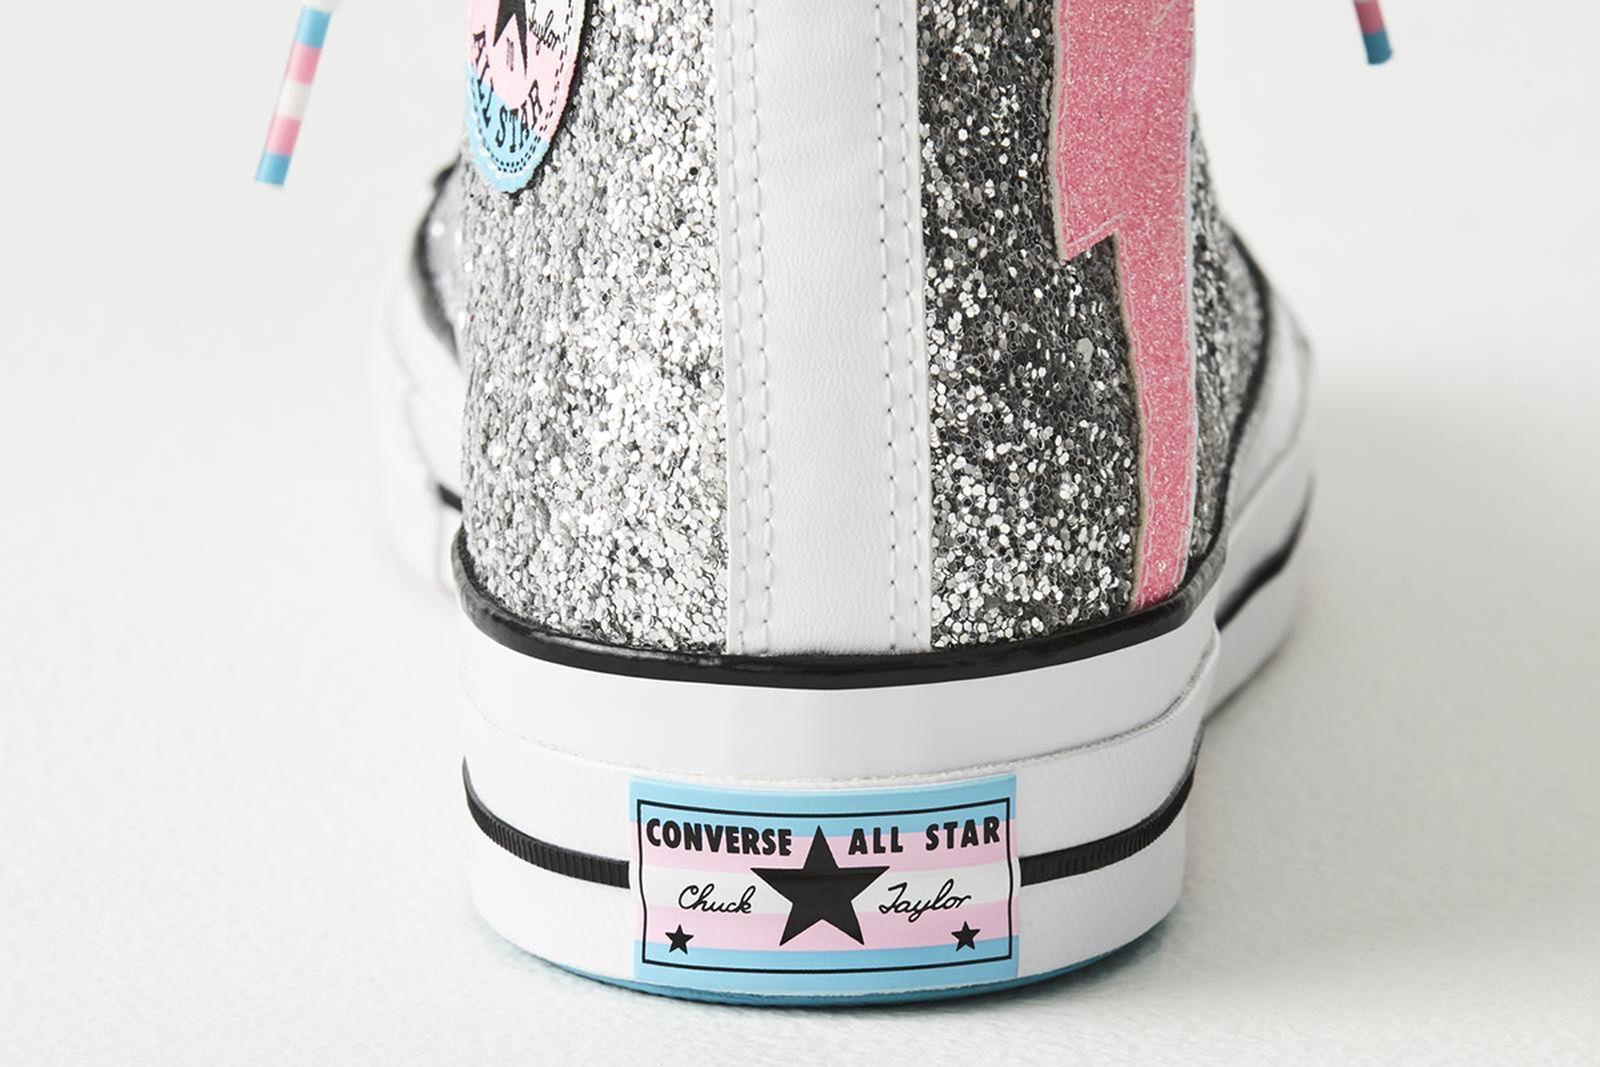 converse pride collection 2019 release date price